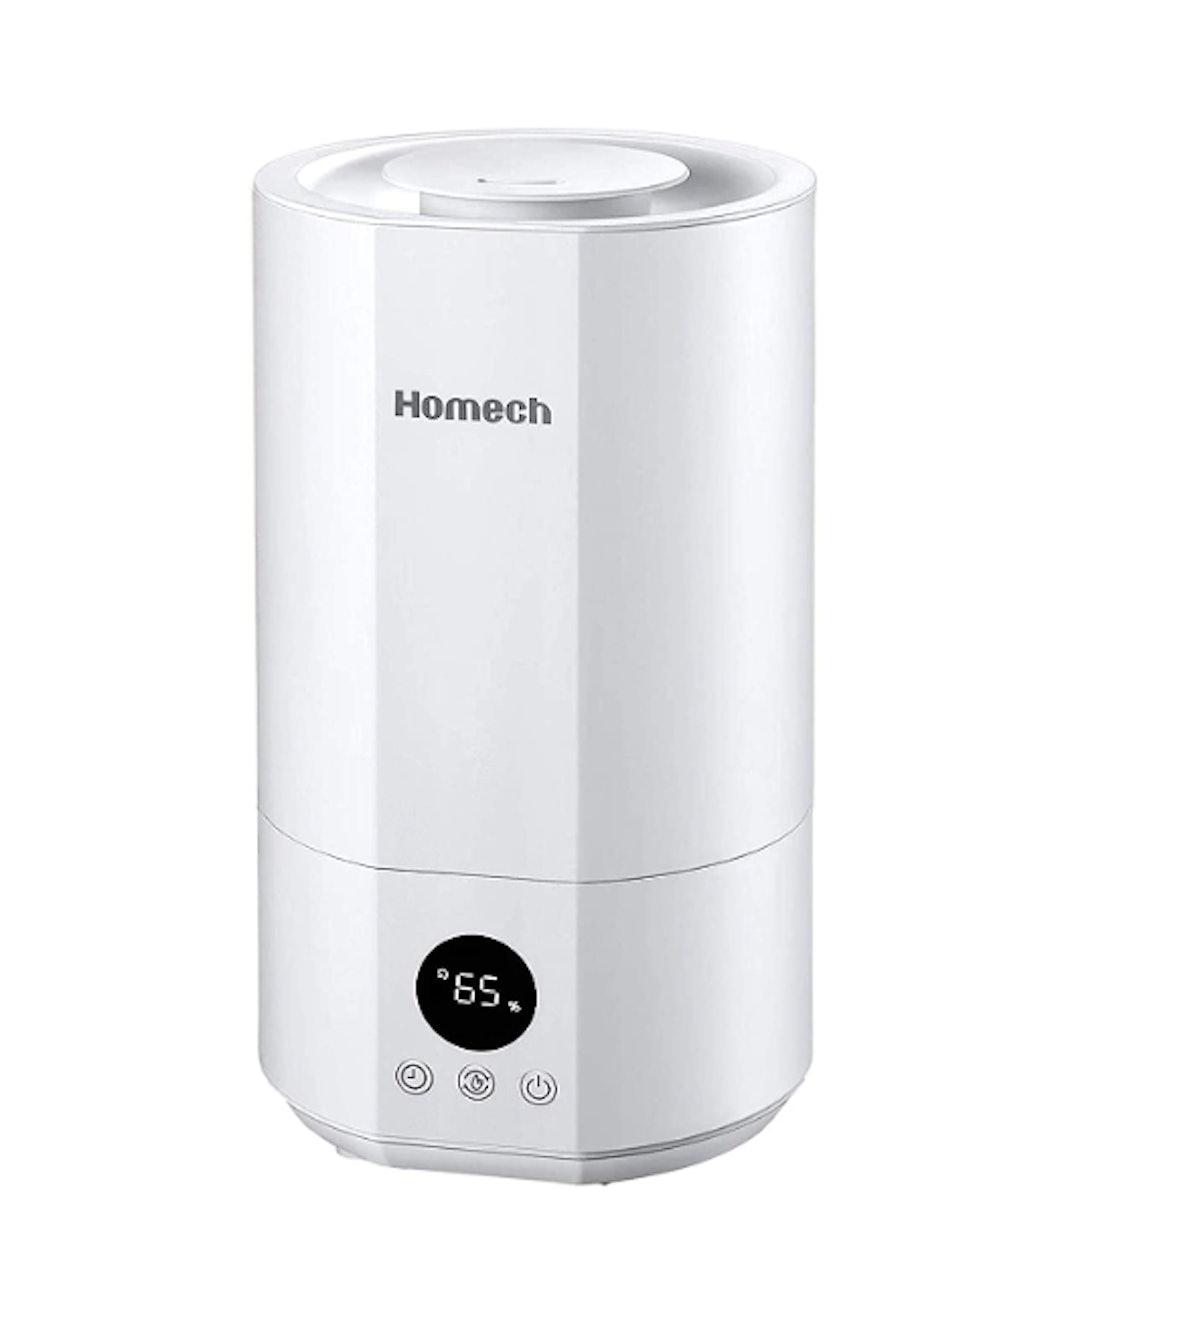 Homech Top Fill Air Humidifiers